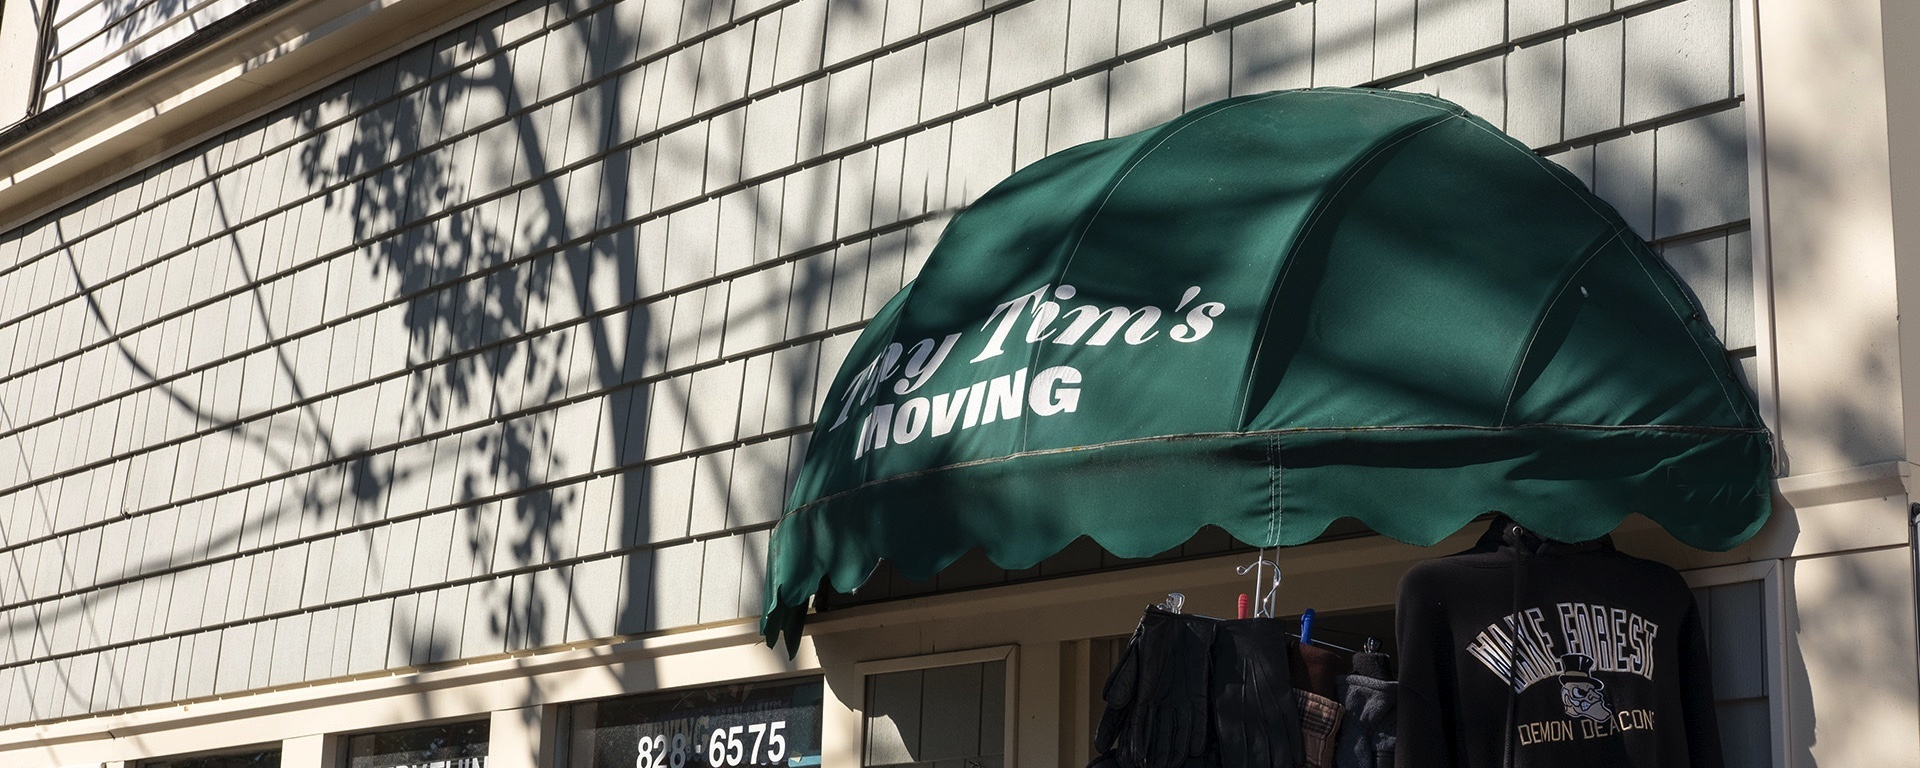 Portland Maine Moving Company Tiny Tim S Moving